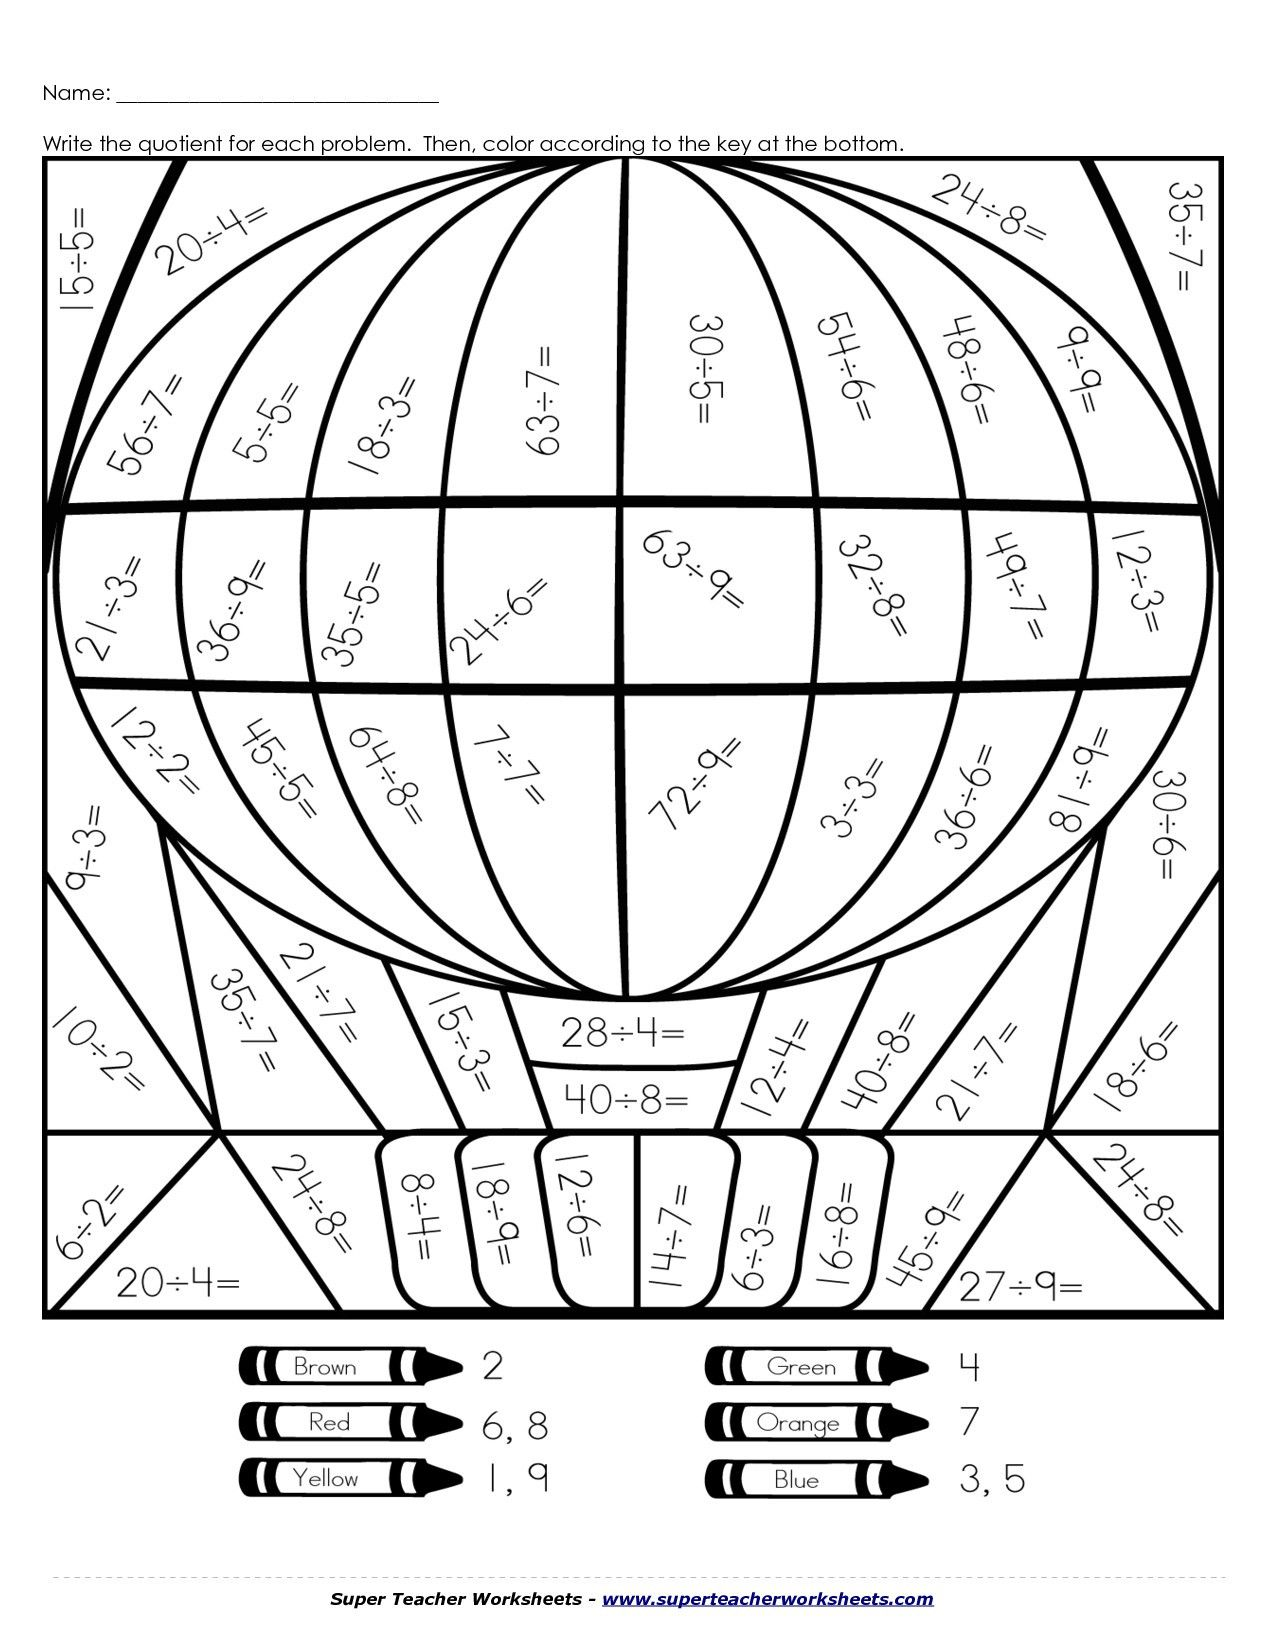 5 Free Math Worksheets Third Grade 3 Addition Add 4 4